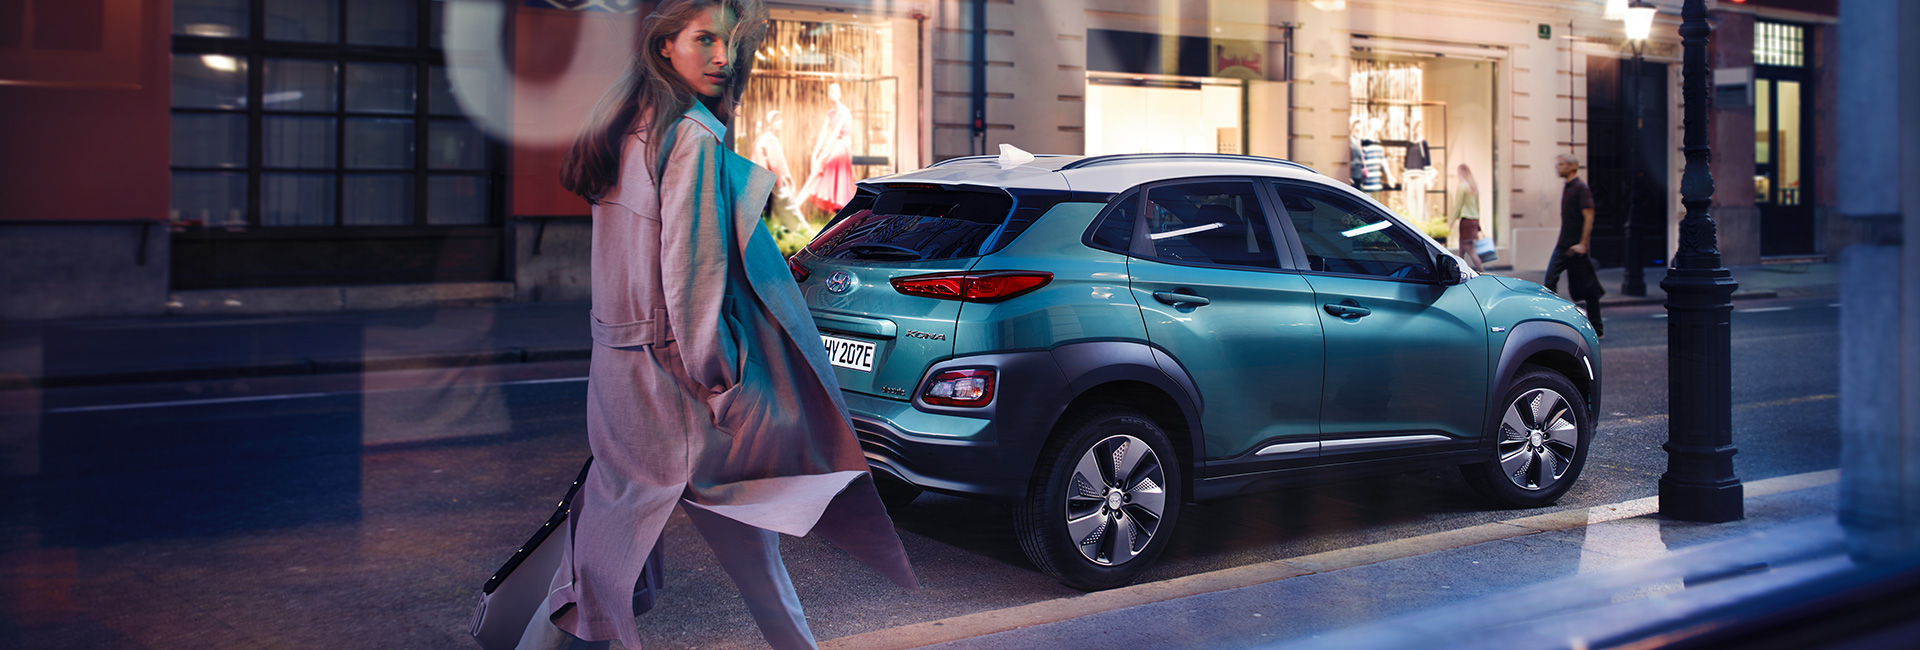 Hyundai Kona EV Style Edition 64 kWh teszt